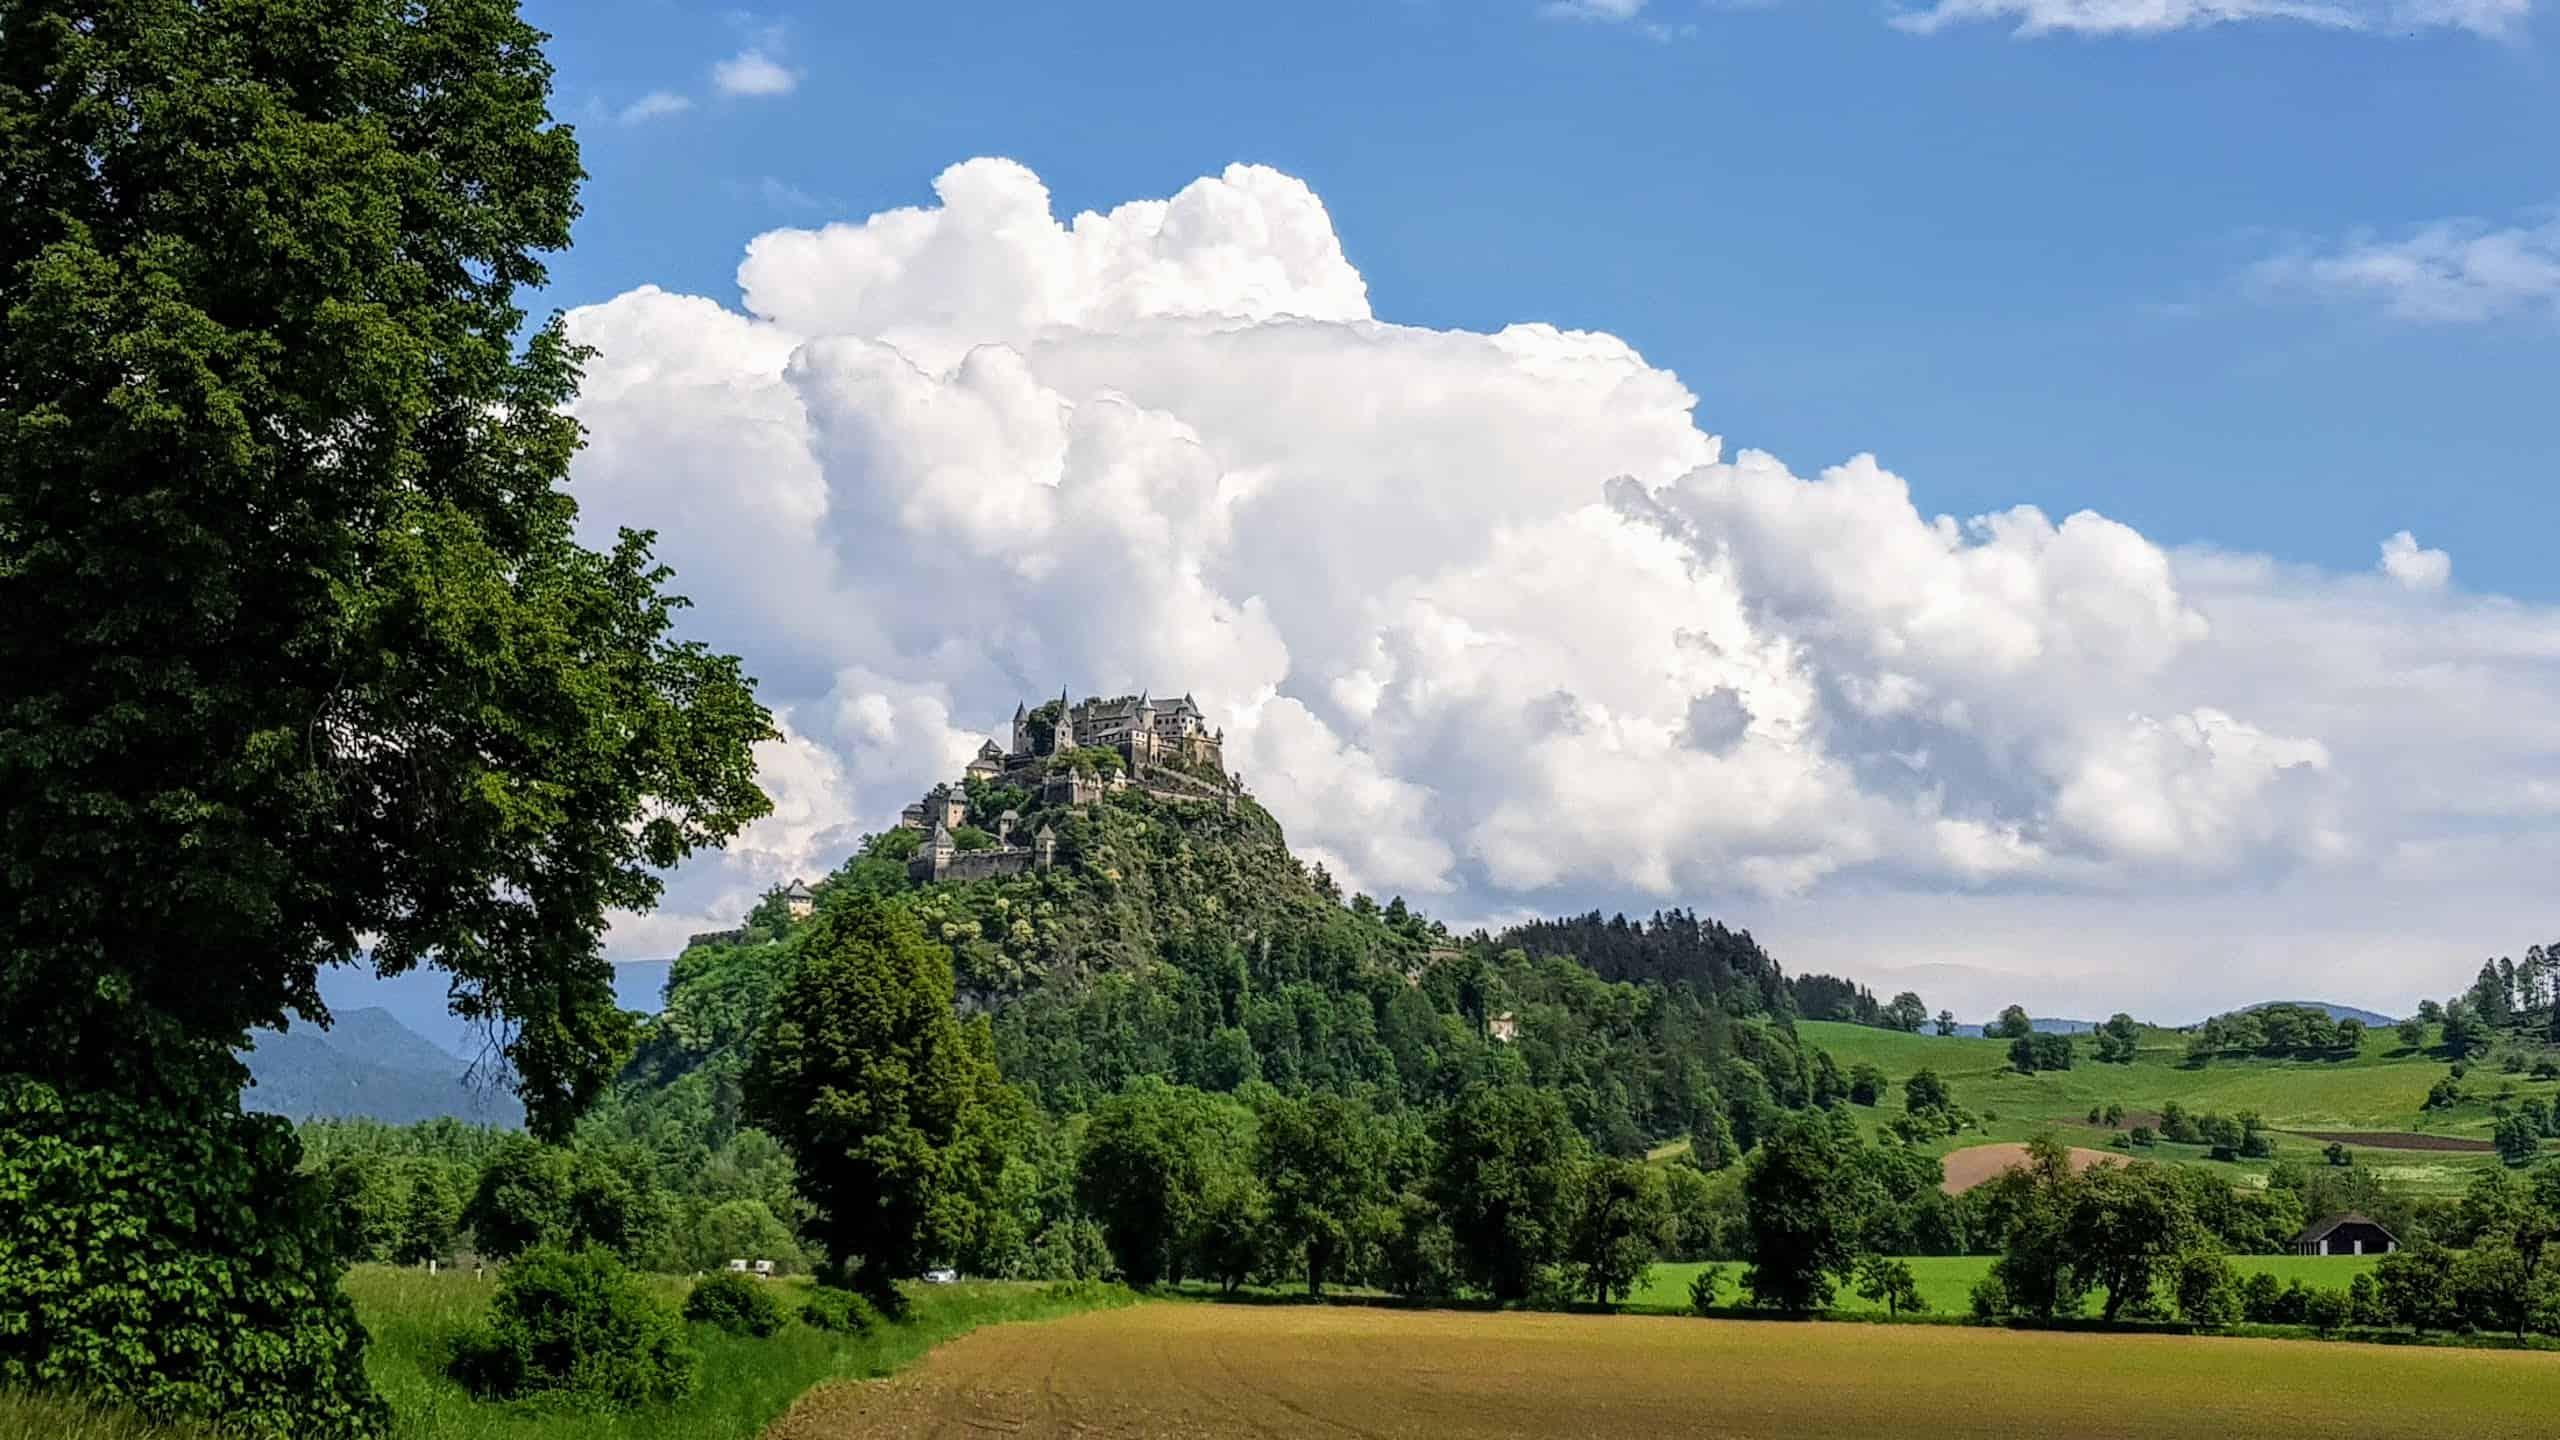 Anfahrt Burg Hochosterwitz Frühling Kärnten Ausflug